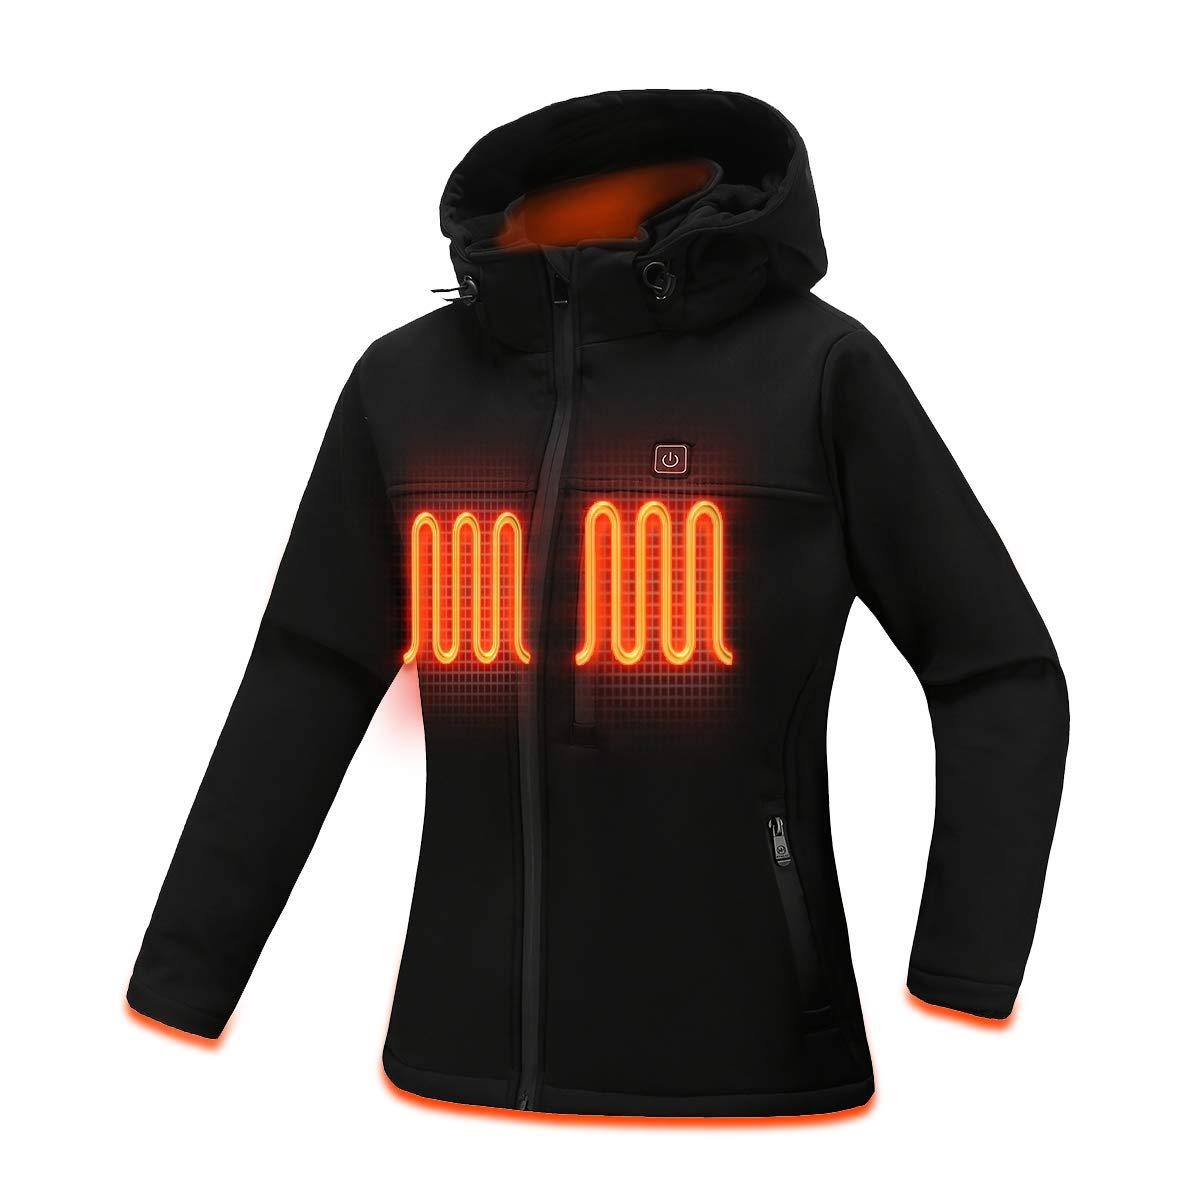 MYHEAT Women's Heated Jacket Soft Shell Eletric Heated Jacket with Detachable Hood and Battery Pack